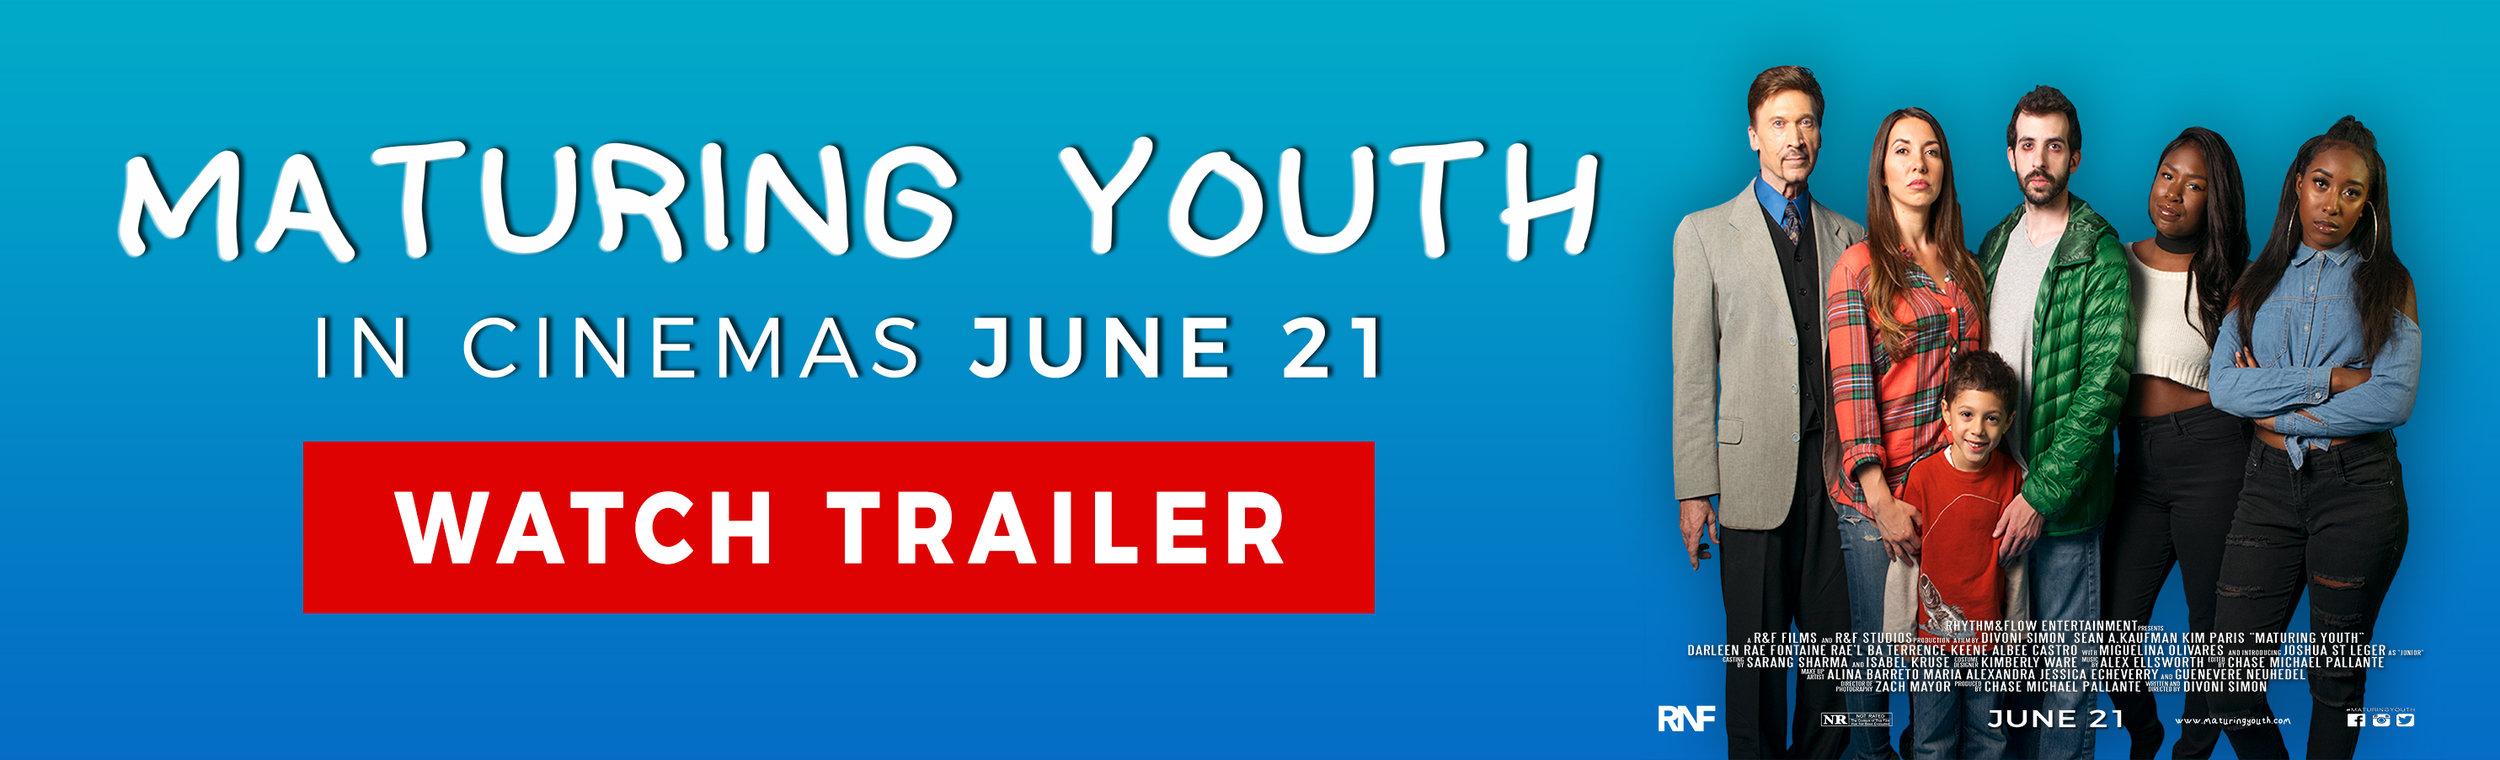 MATURING YOUTH IN CINEMAS JUNE 21 BANNER.jpg